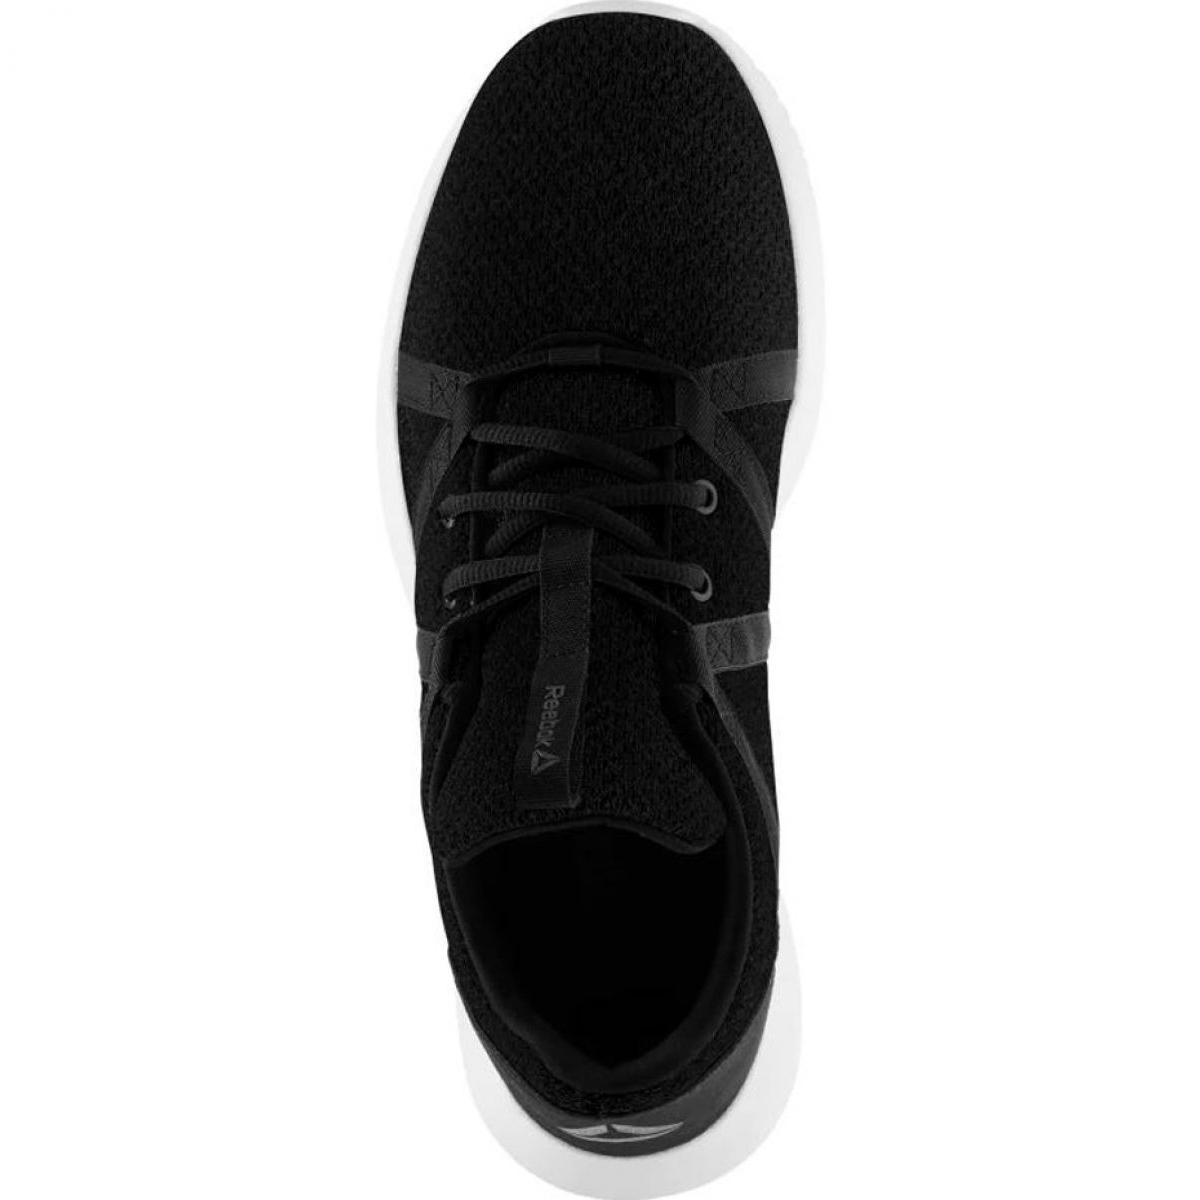 Chaussures-Reebok-Reago-Essential-M-CN4624-noir miniature 3